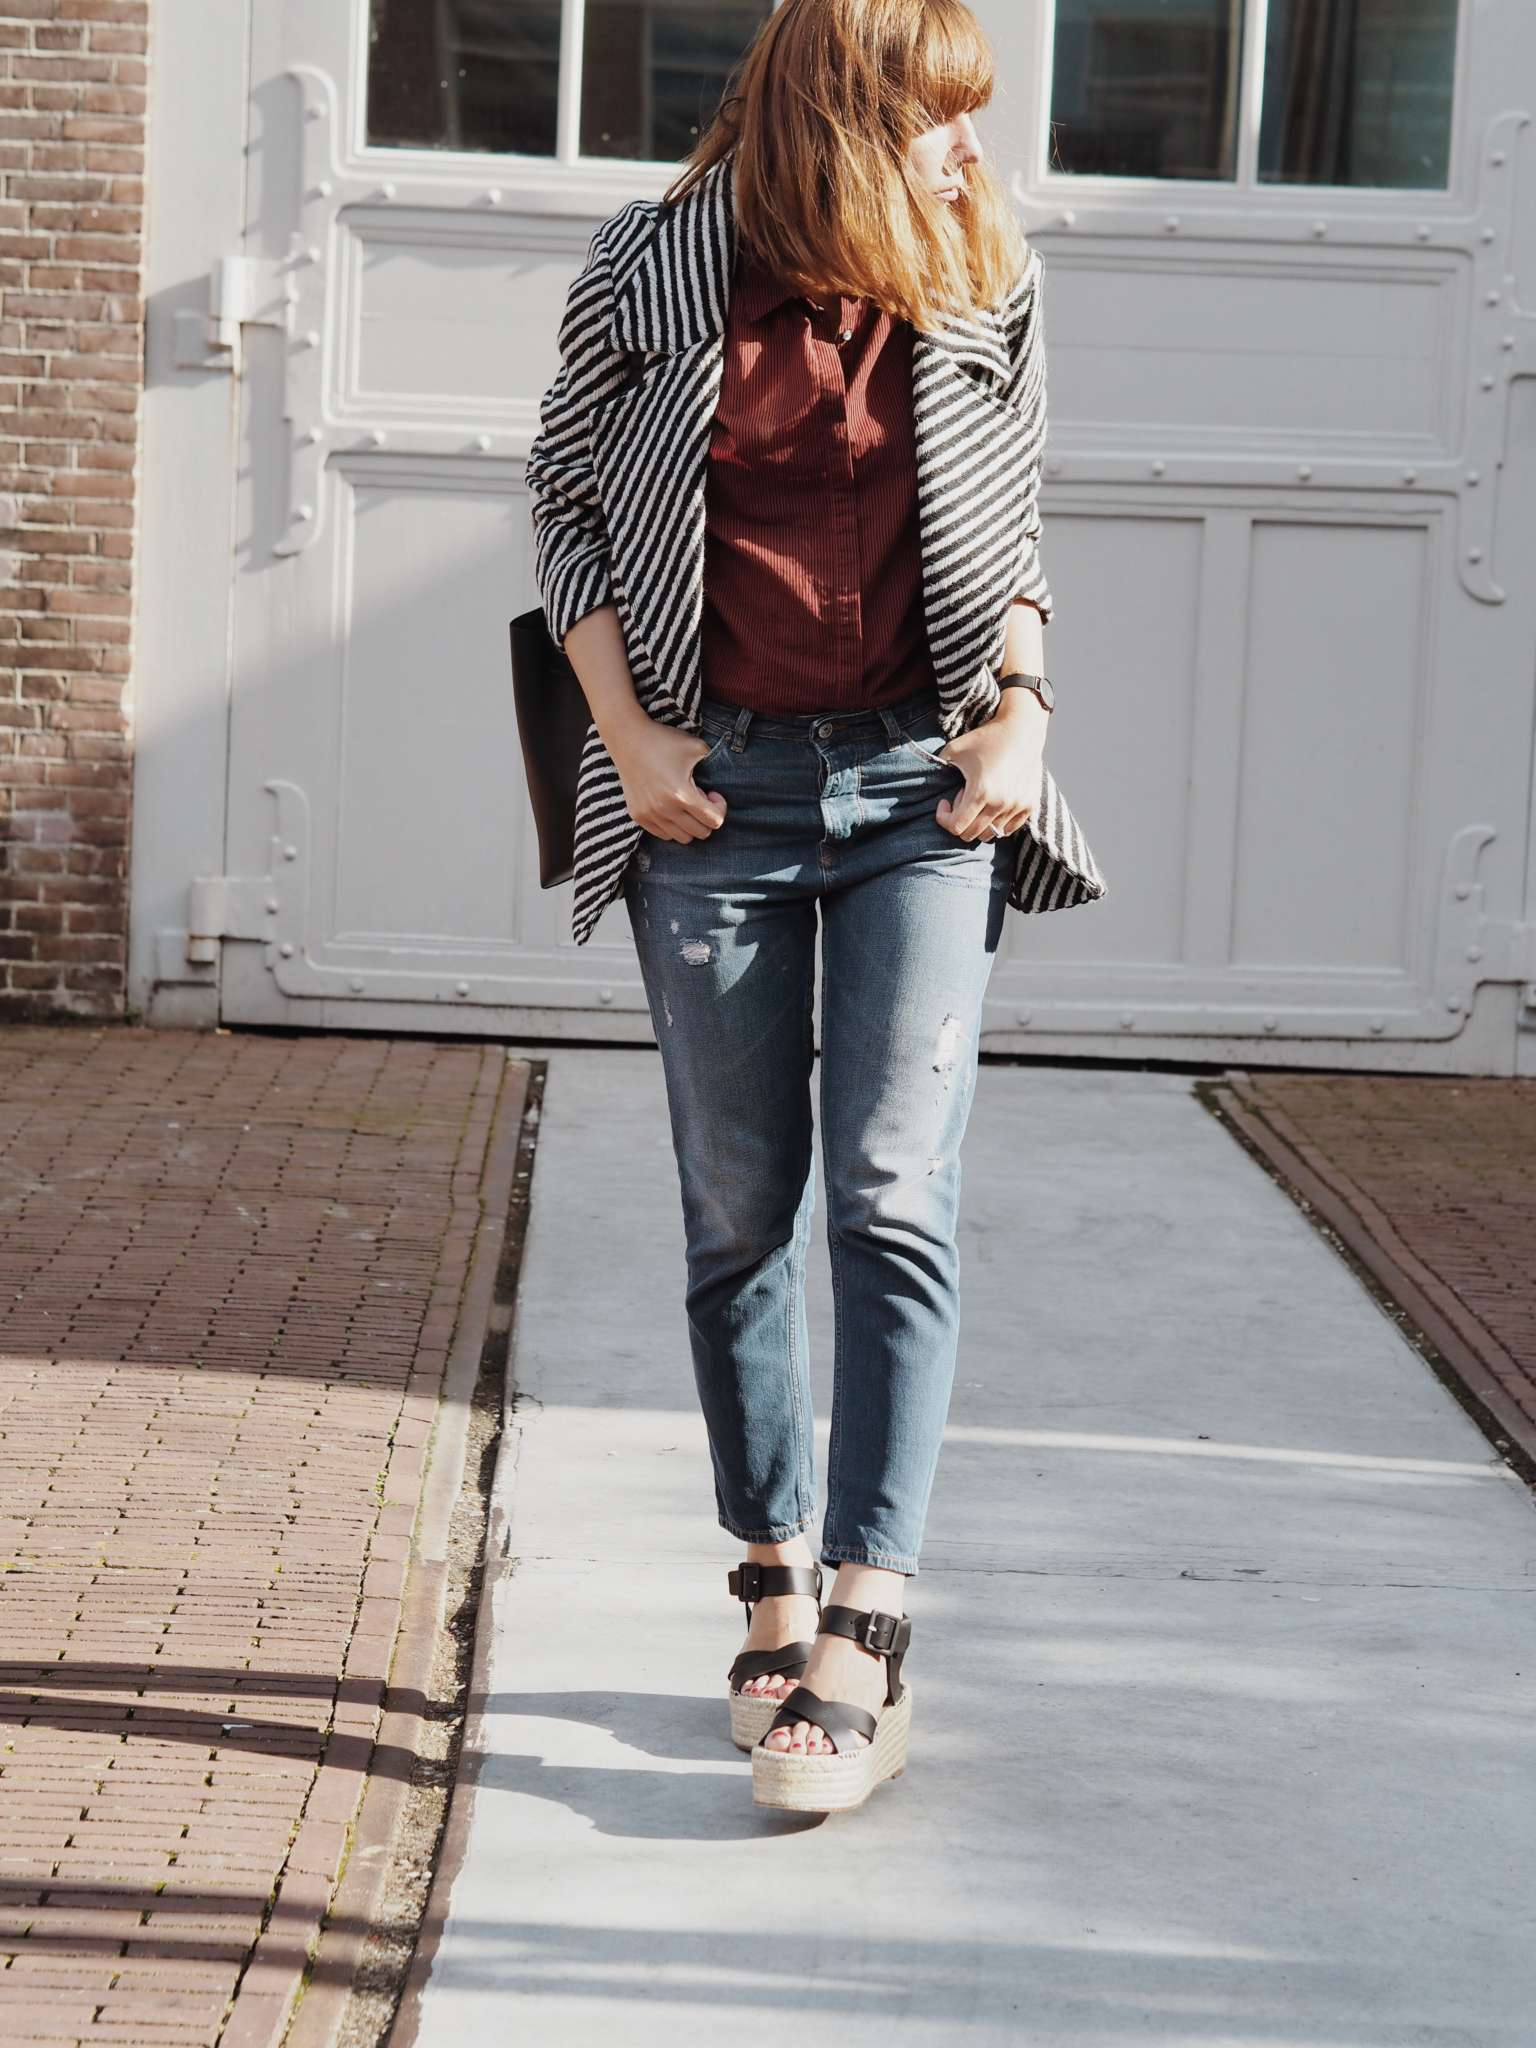 Amsterdam-Blauw-boyfriend-jeans-celine-denim-Instagram-Stories-lancaster-Scotch&Soda-Snapchat-stripes